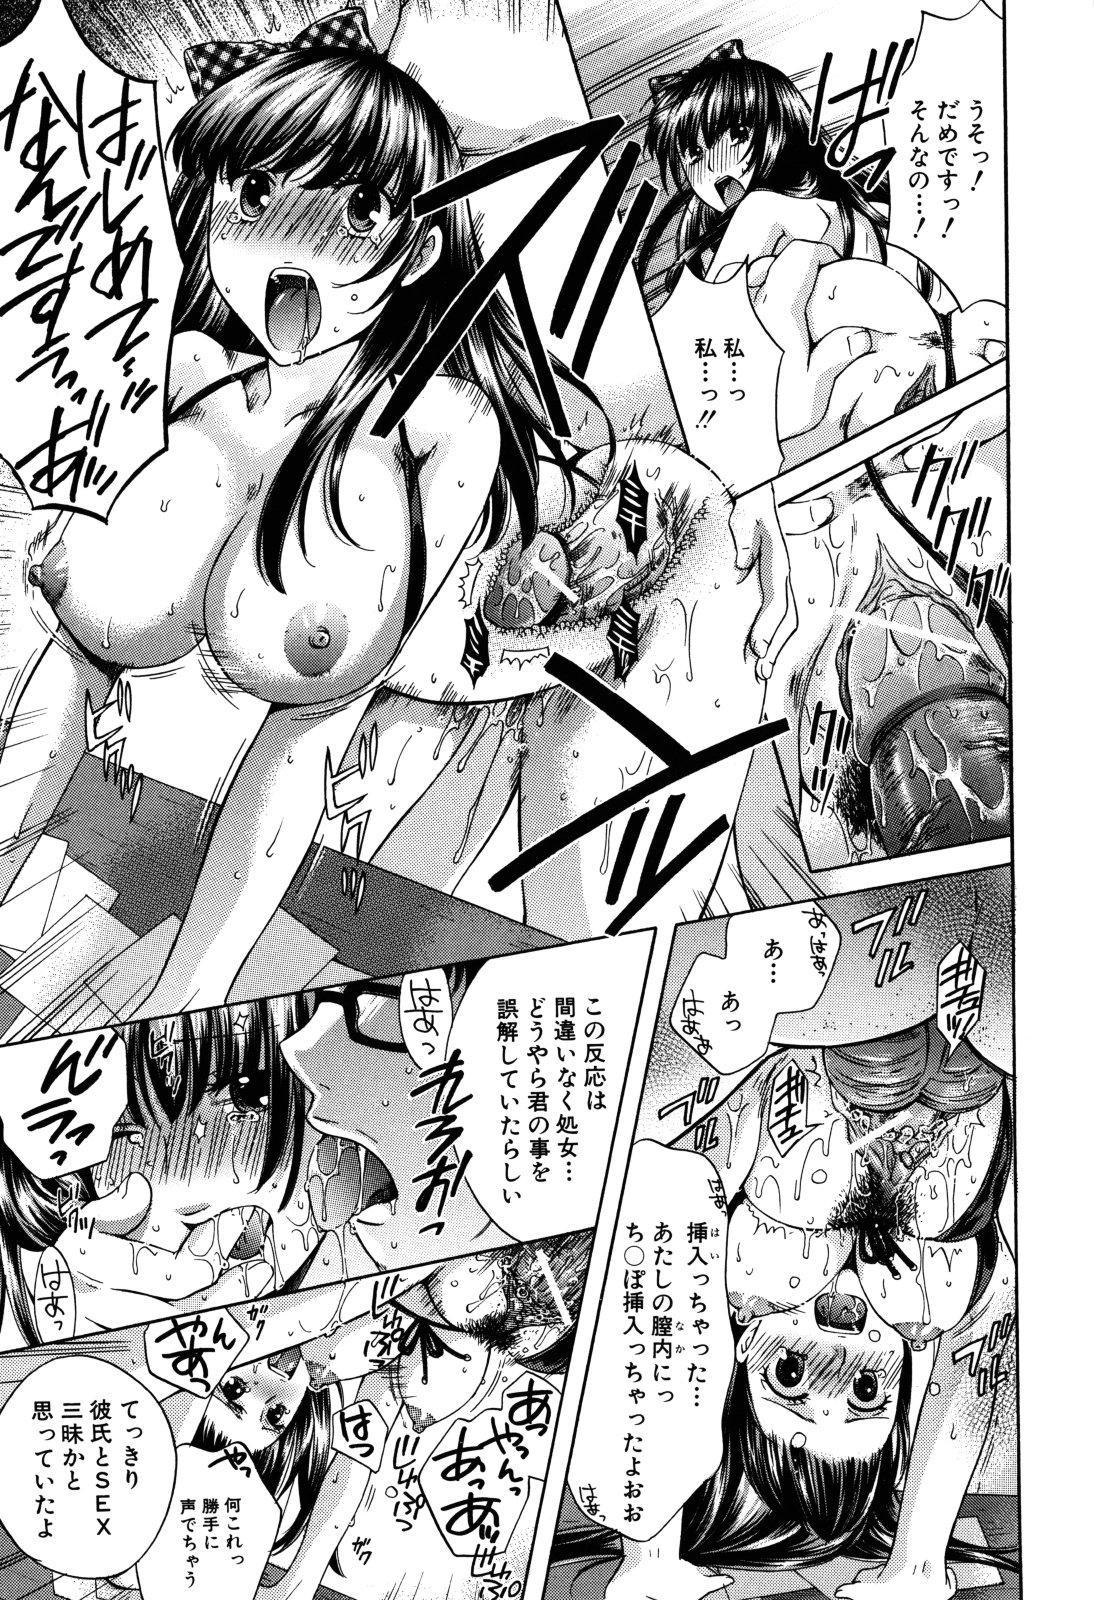 Kanojo ga Ochiru made - She in the depth 40